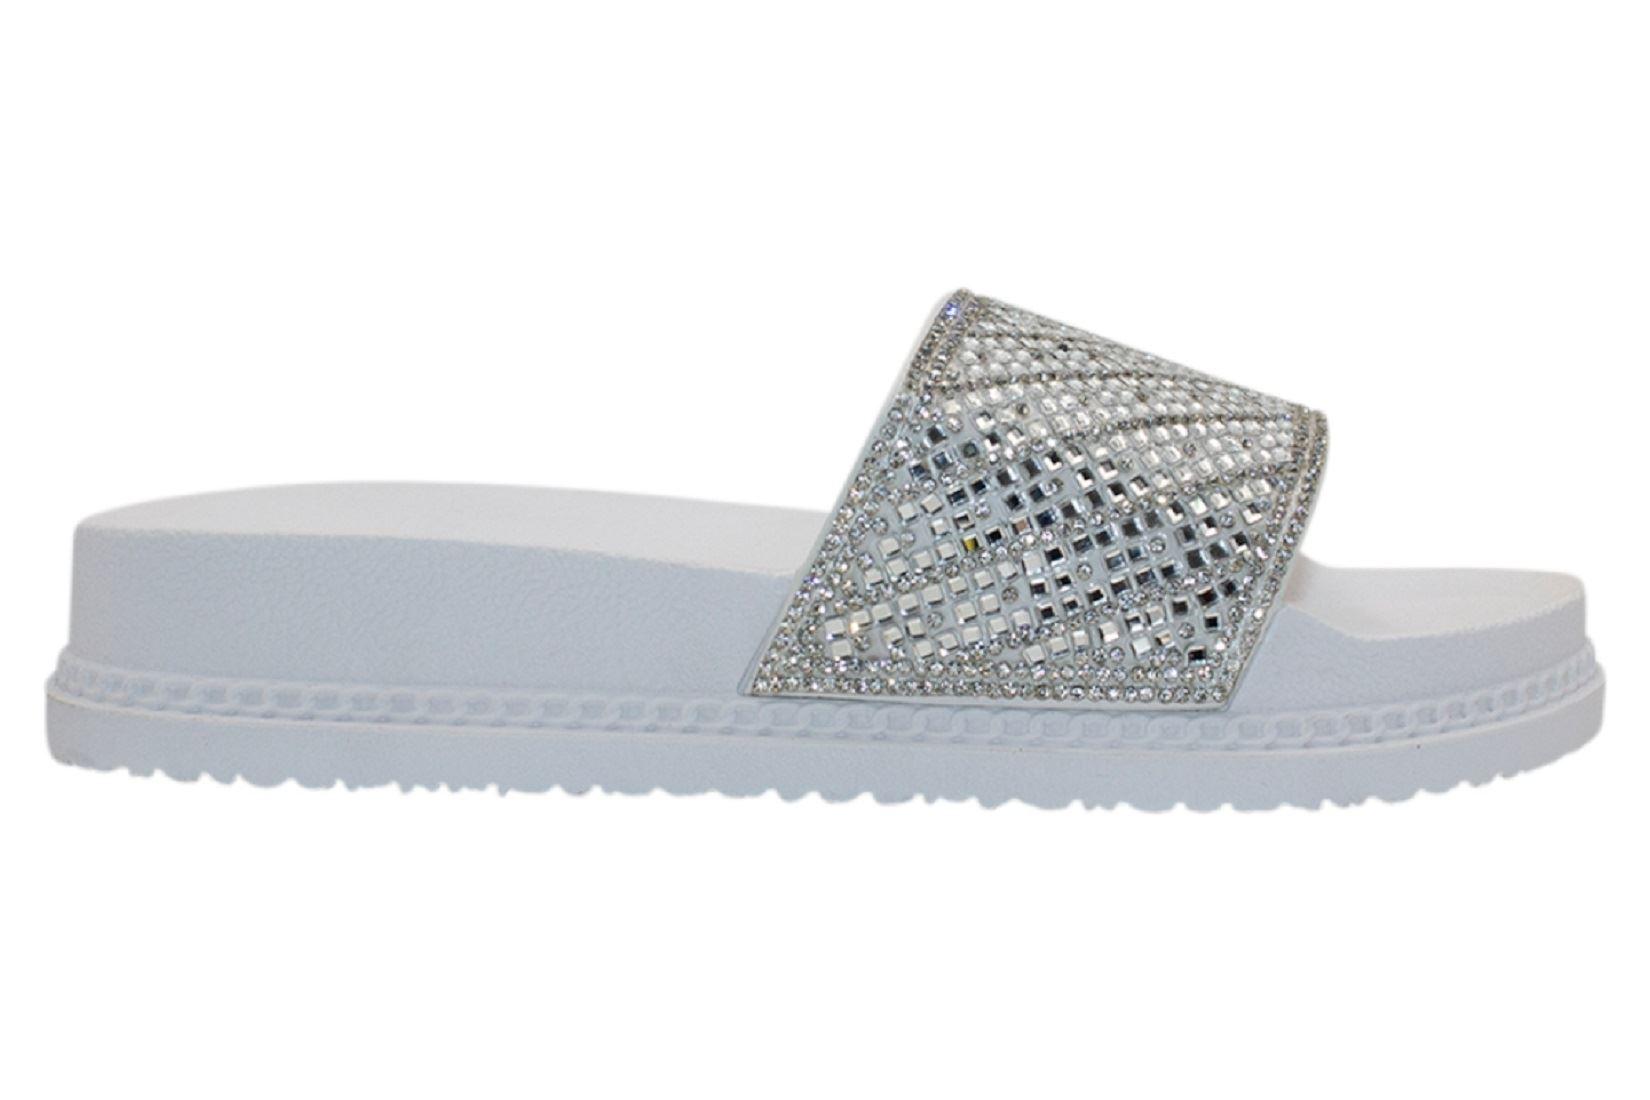 Womens-Sliders-Casual-Slippers-Mules-Ladies-Diamante-Flip-Flop-Sandals-Shoes thumbnail 77